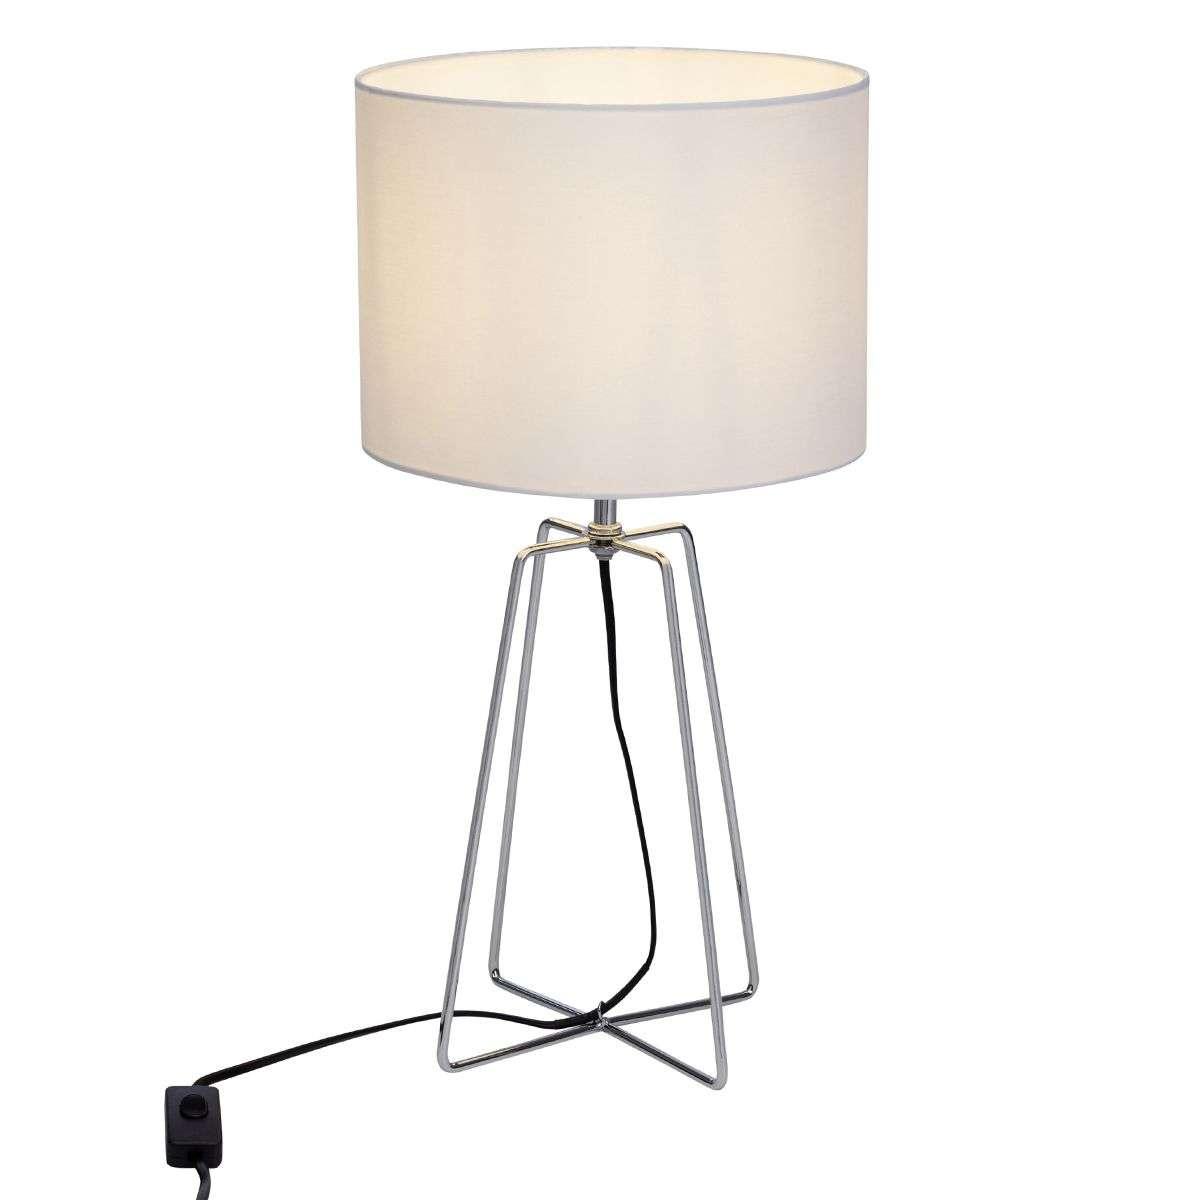 Pretty table lamp grigory white fabric lampshade lights pretty table lamp grigory white fabric lampshade 1509216 31 aloadofball Choice Image